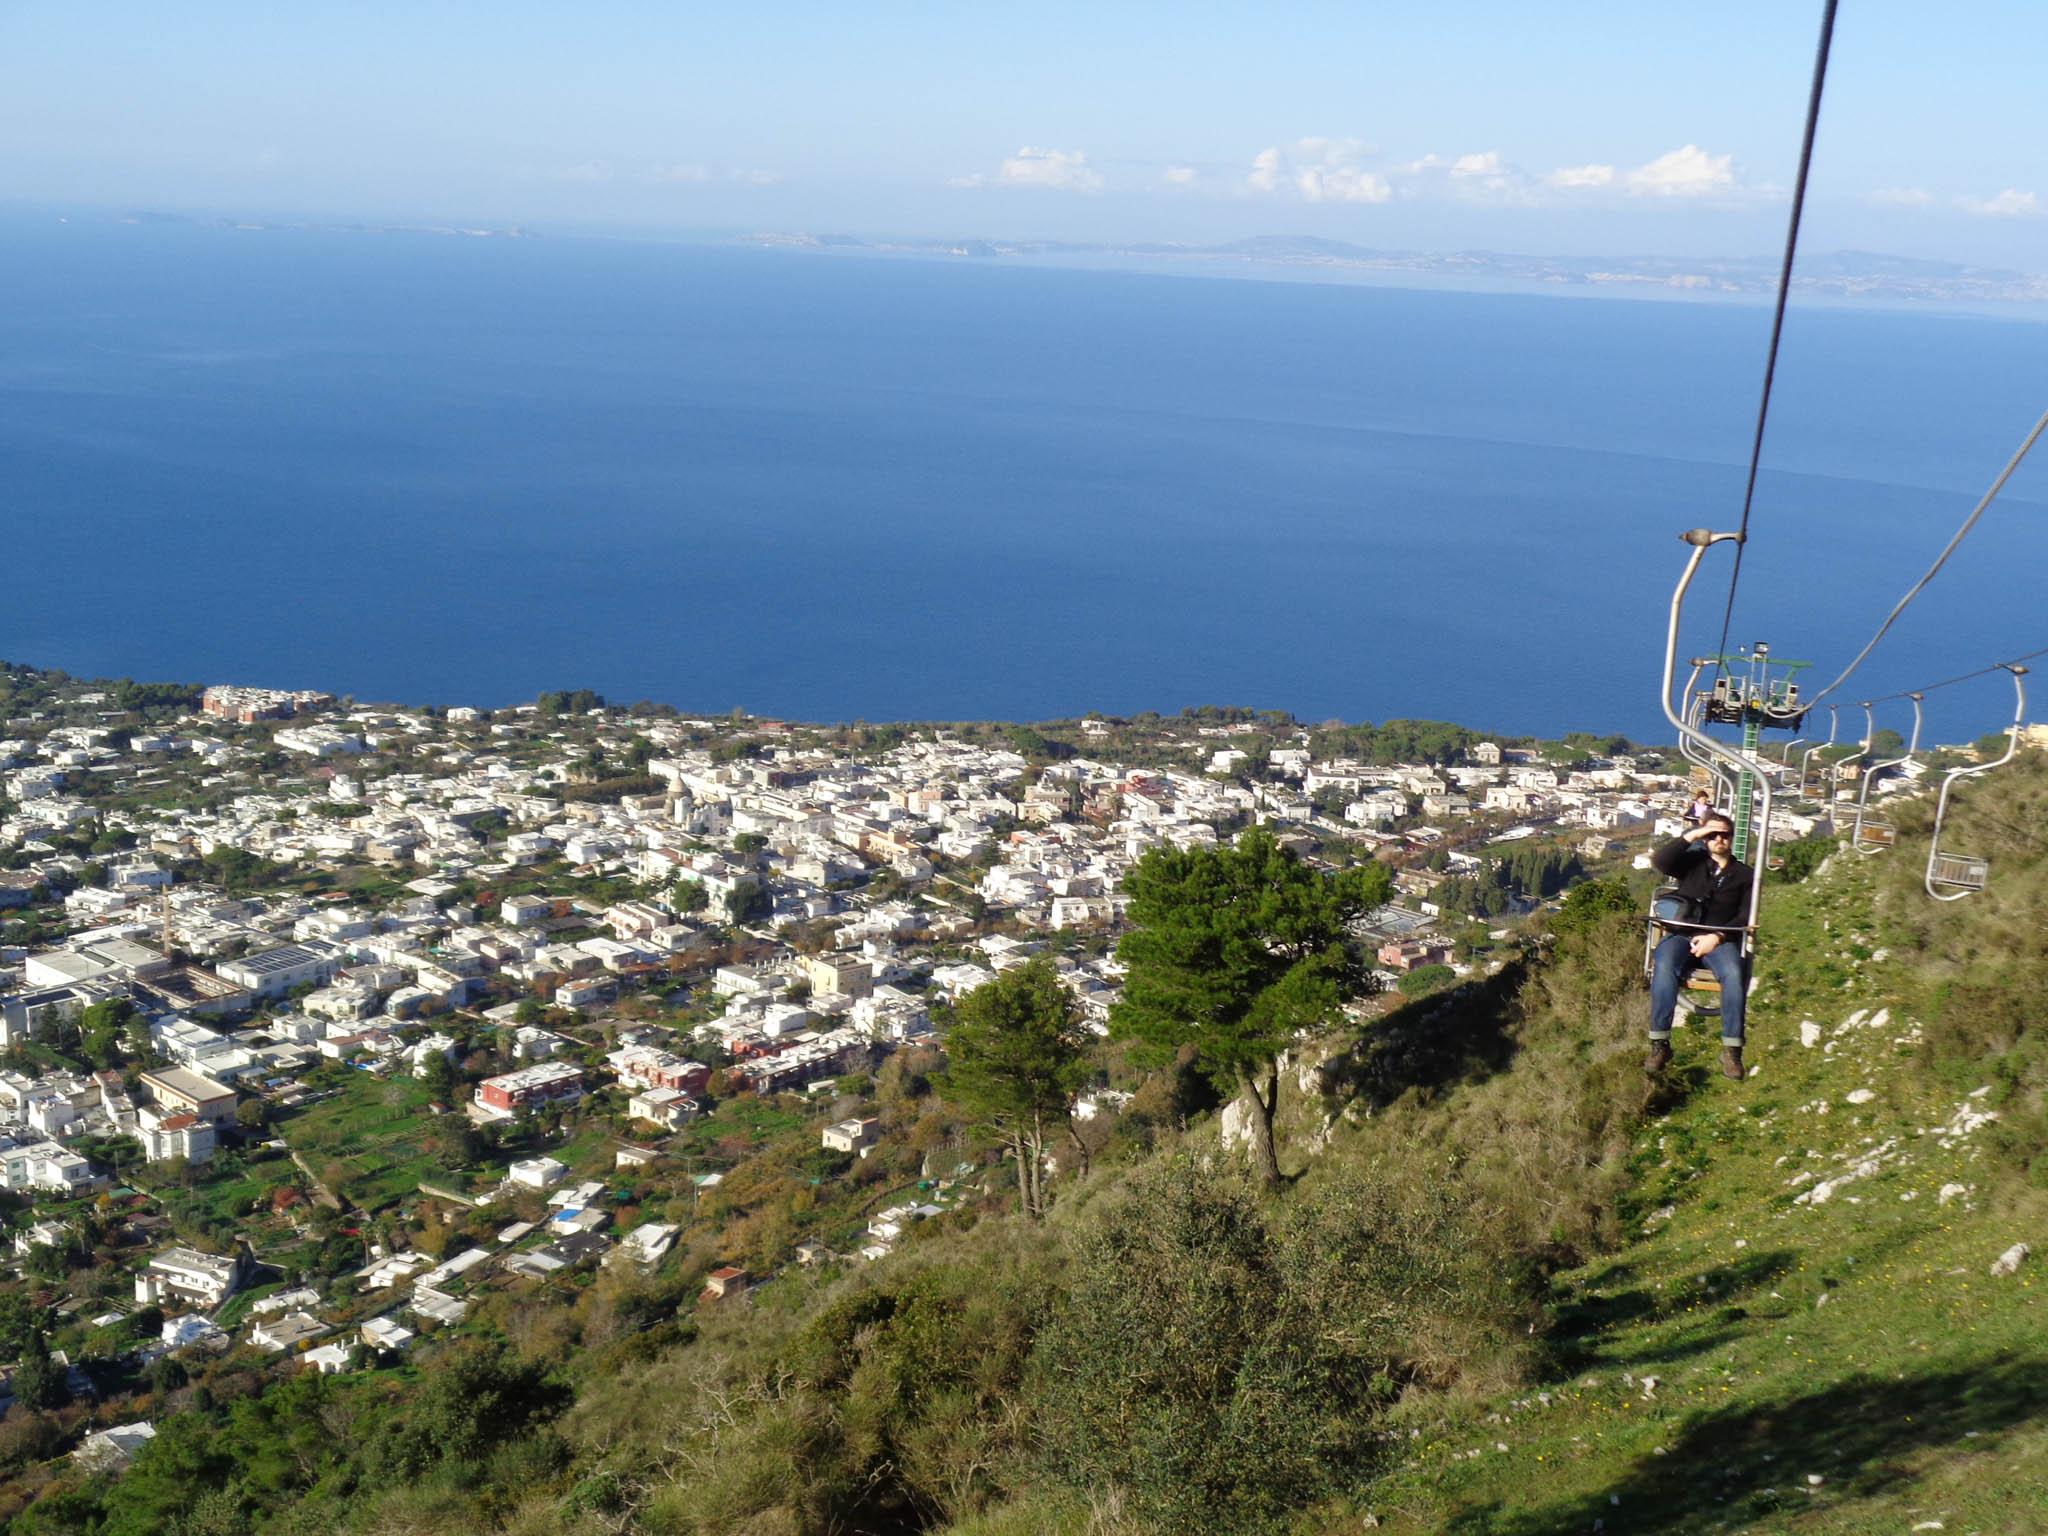 chairlift capri italy